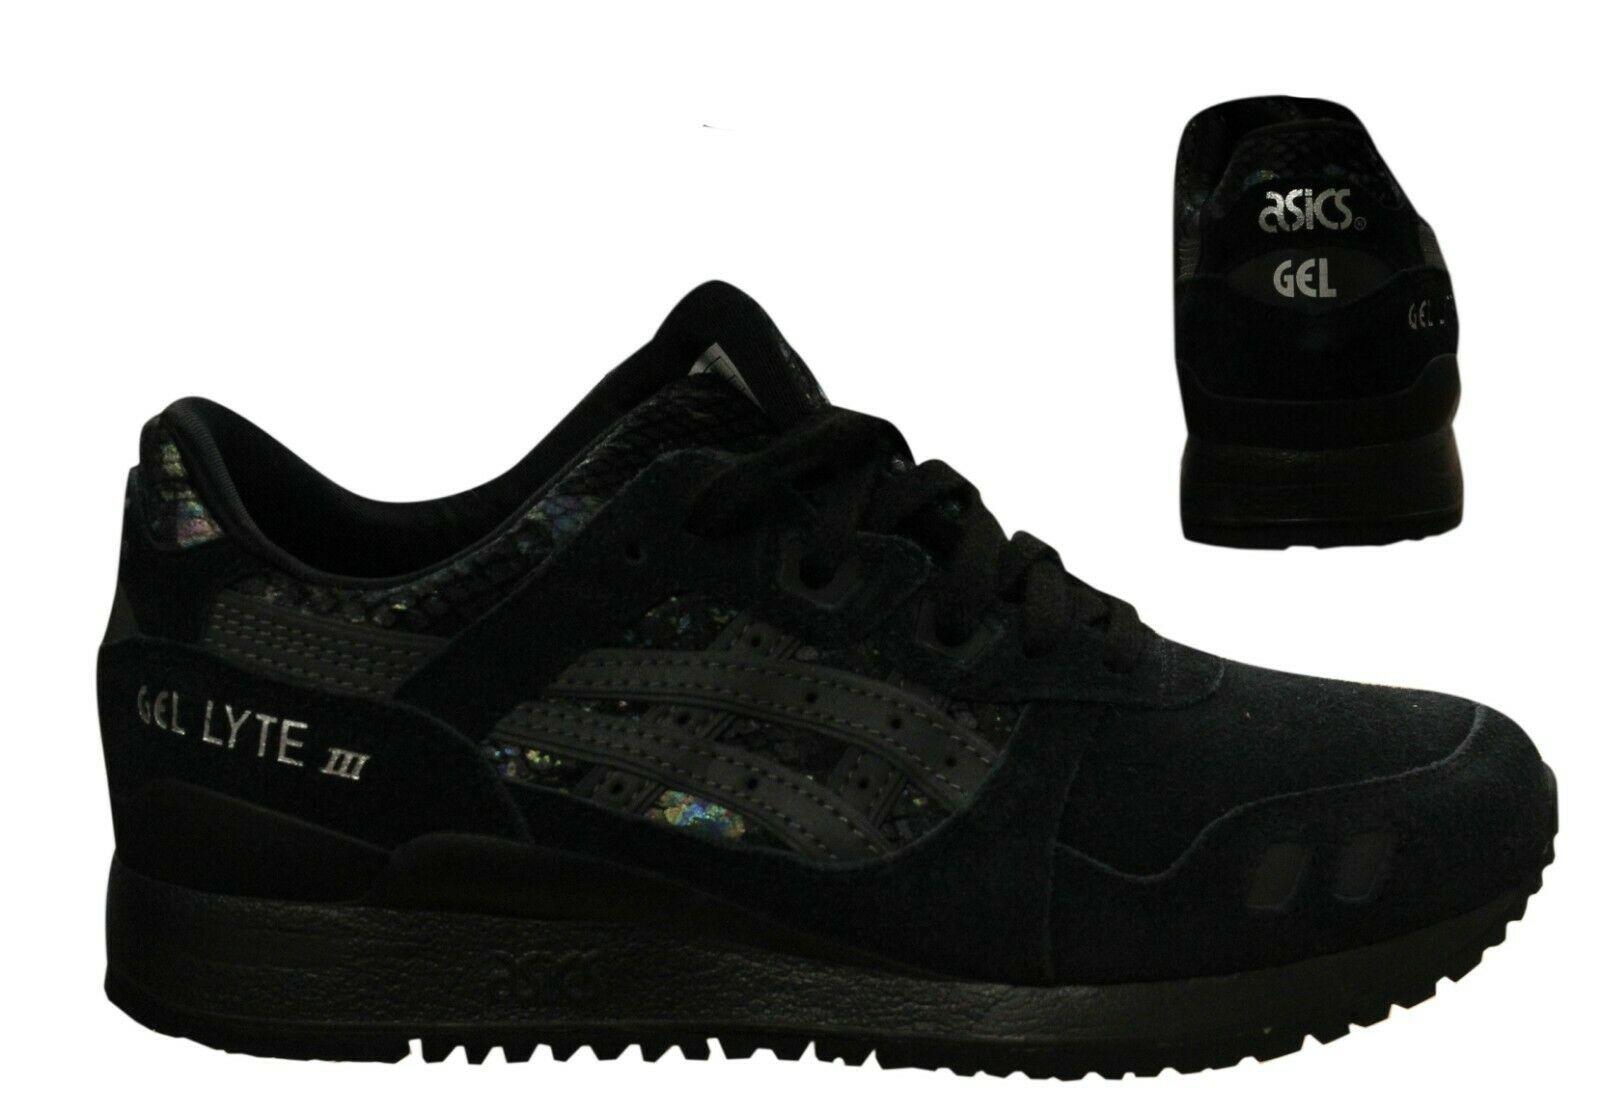 Asics Gel-Lyte III Lace Up Womens Trainers Running Black HN6K5 ...